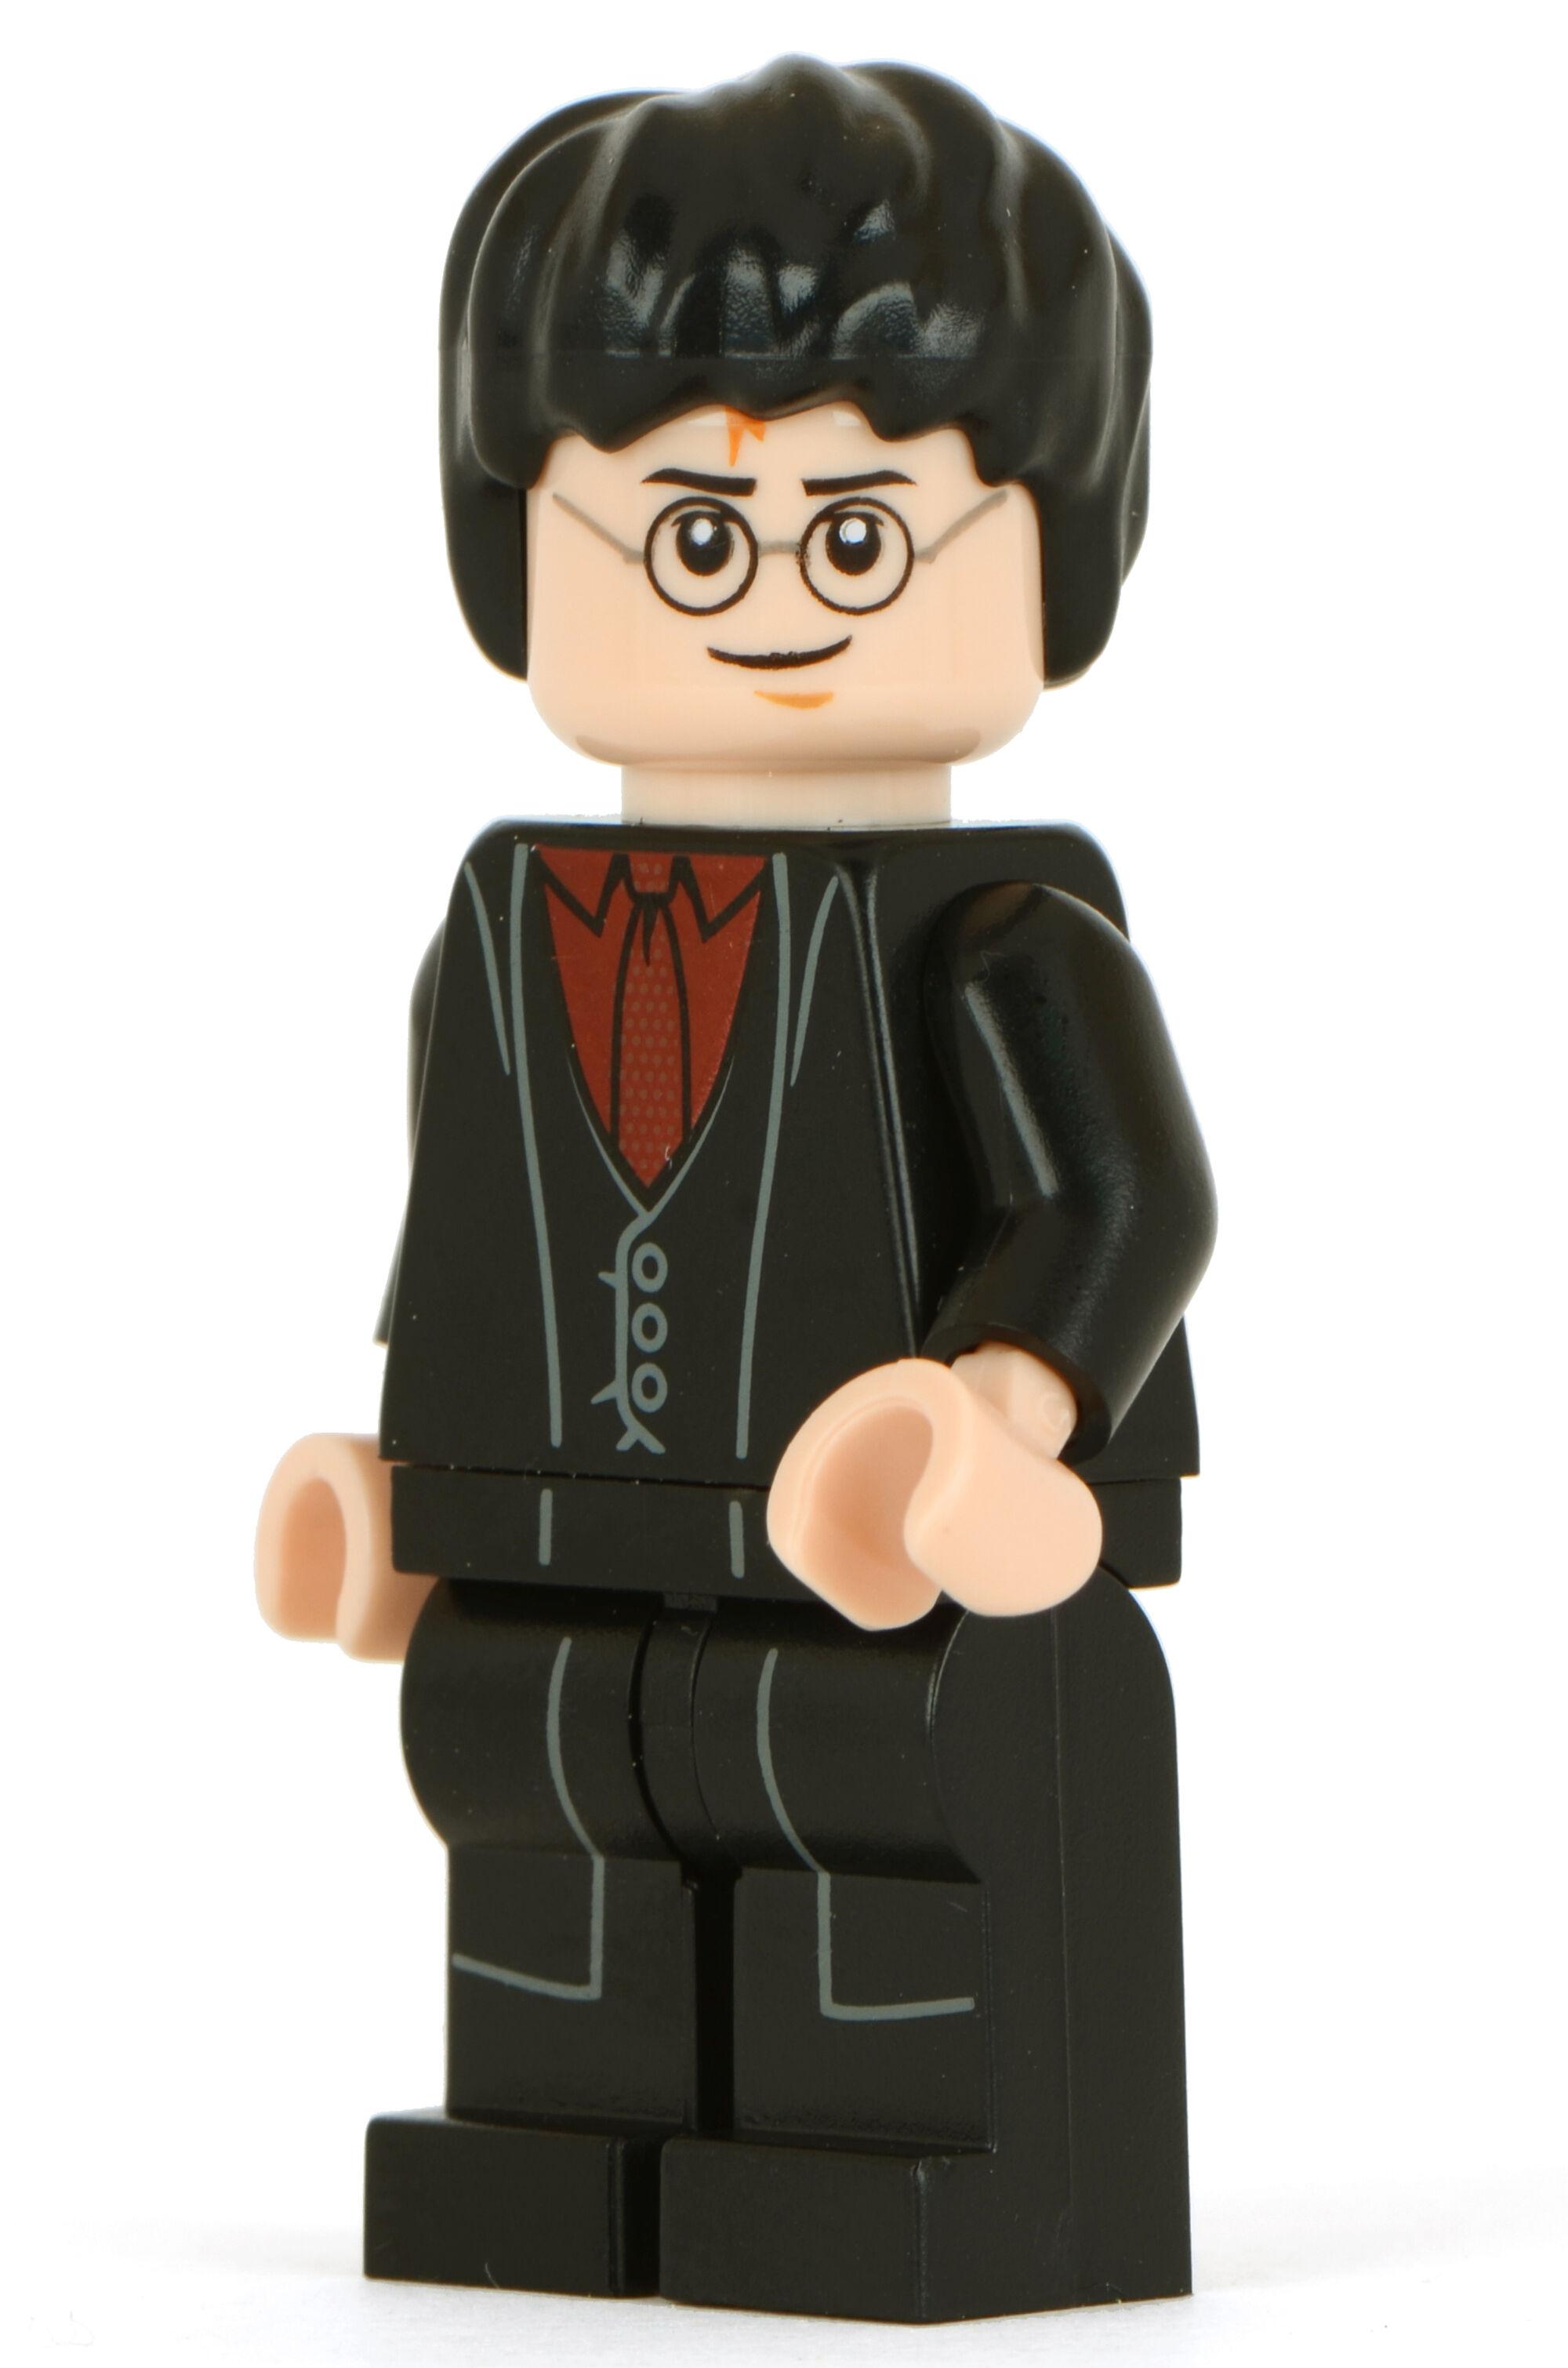 Harry Potter Minifigure Brickipedia Fandom Powered